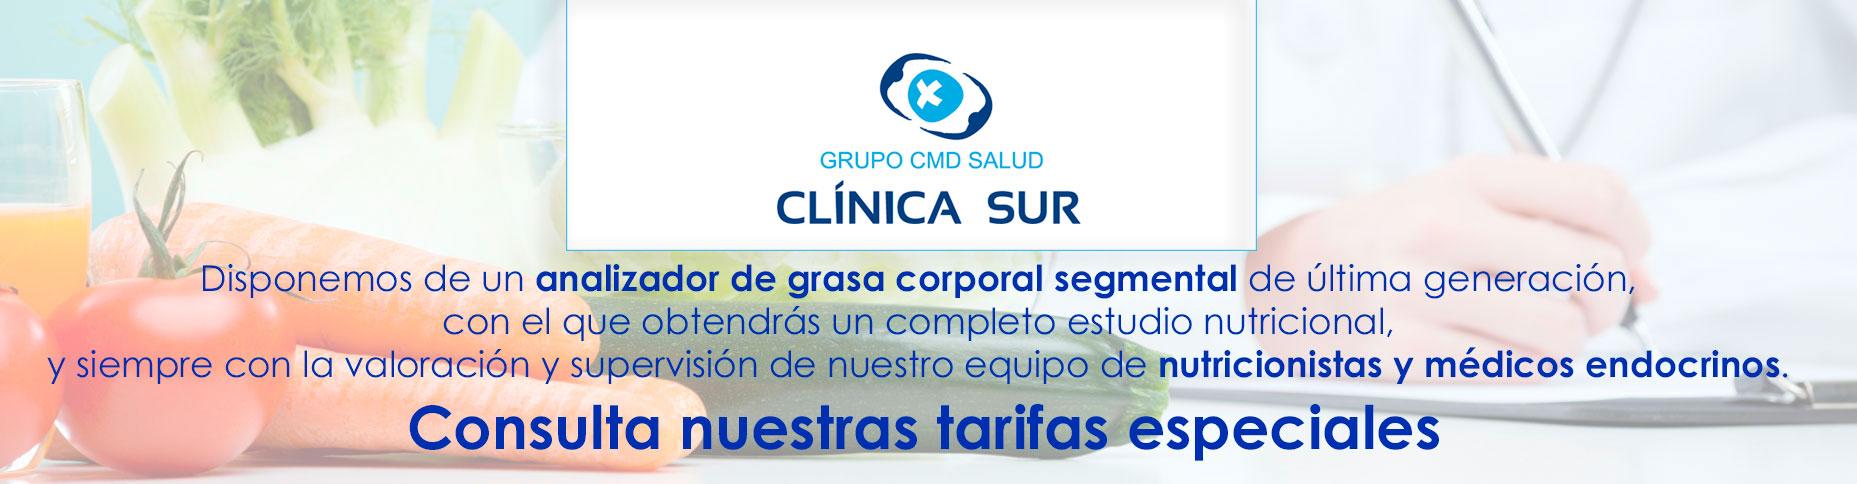 banner_masa_corporal_clinicasur-2